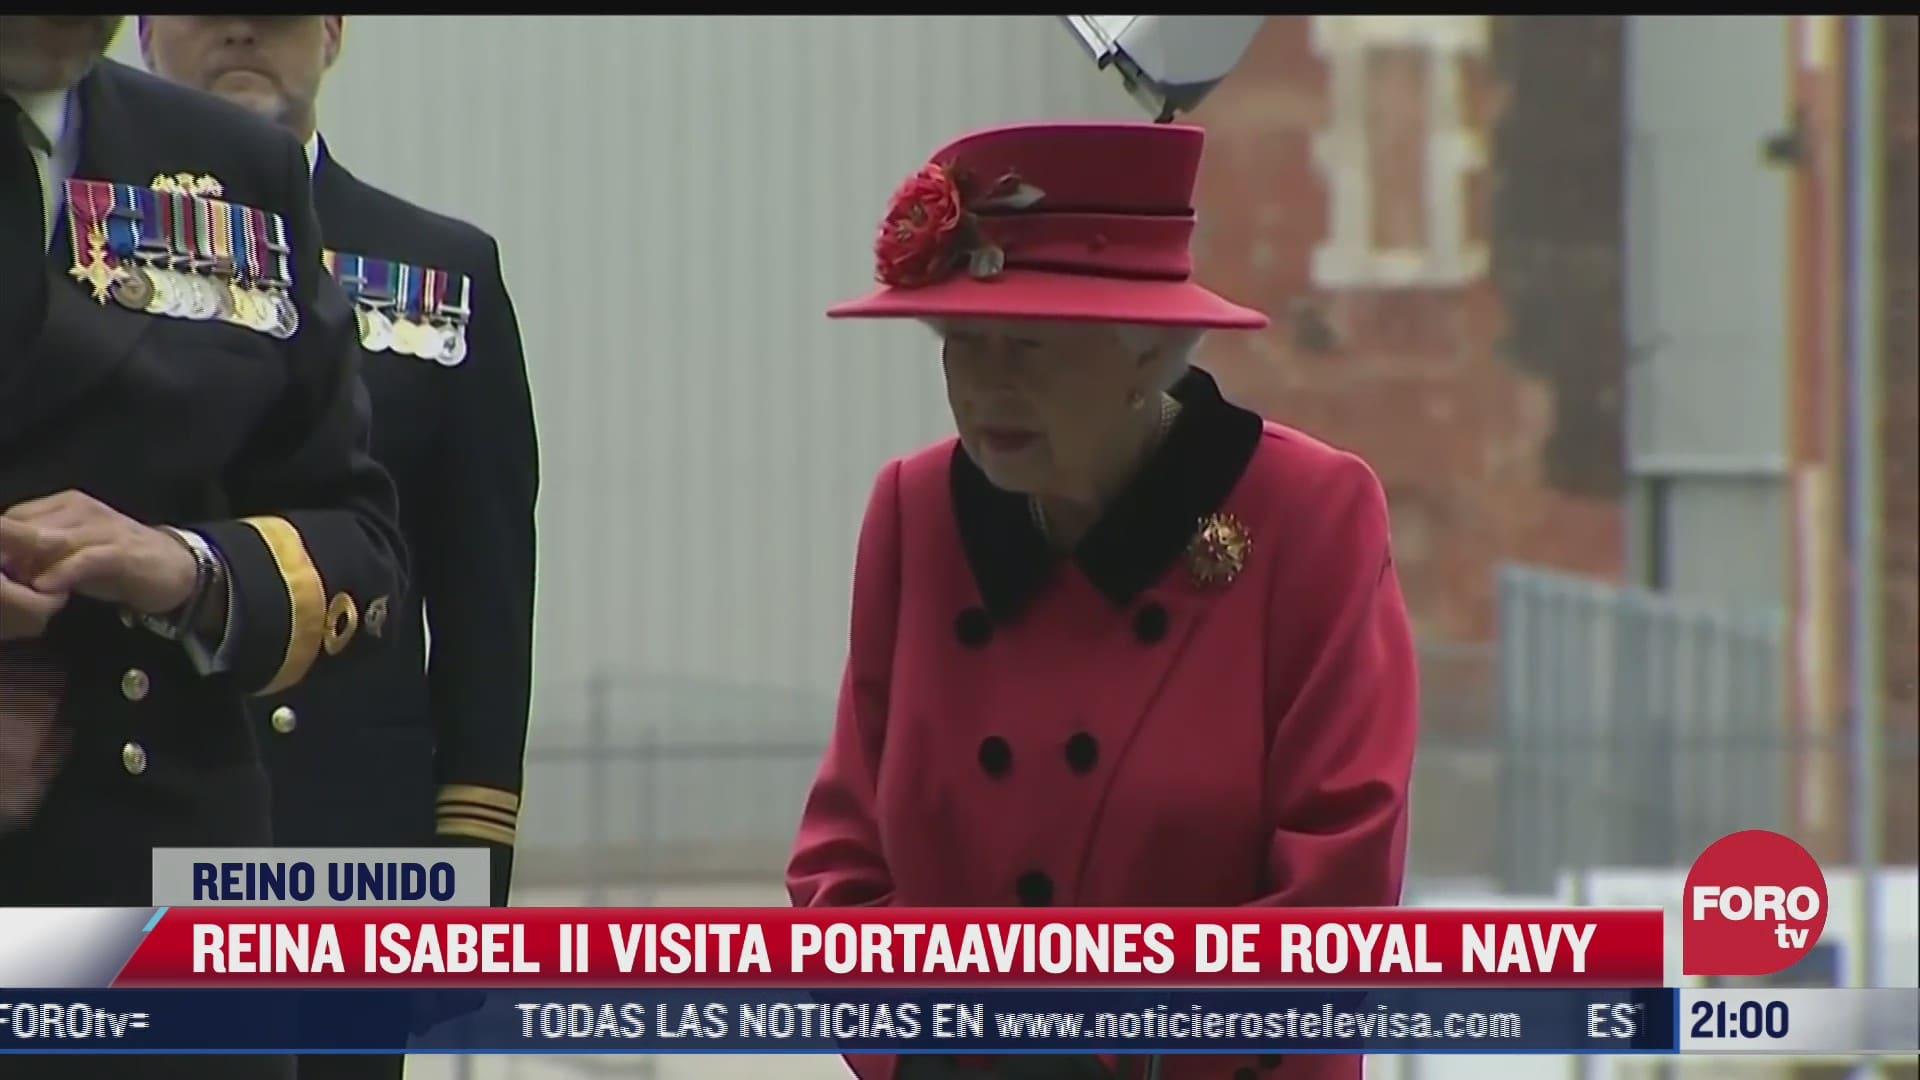 reina isabel ii visita portaaviones de royal navy